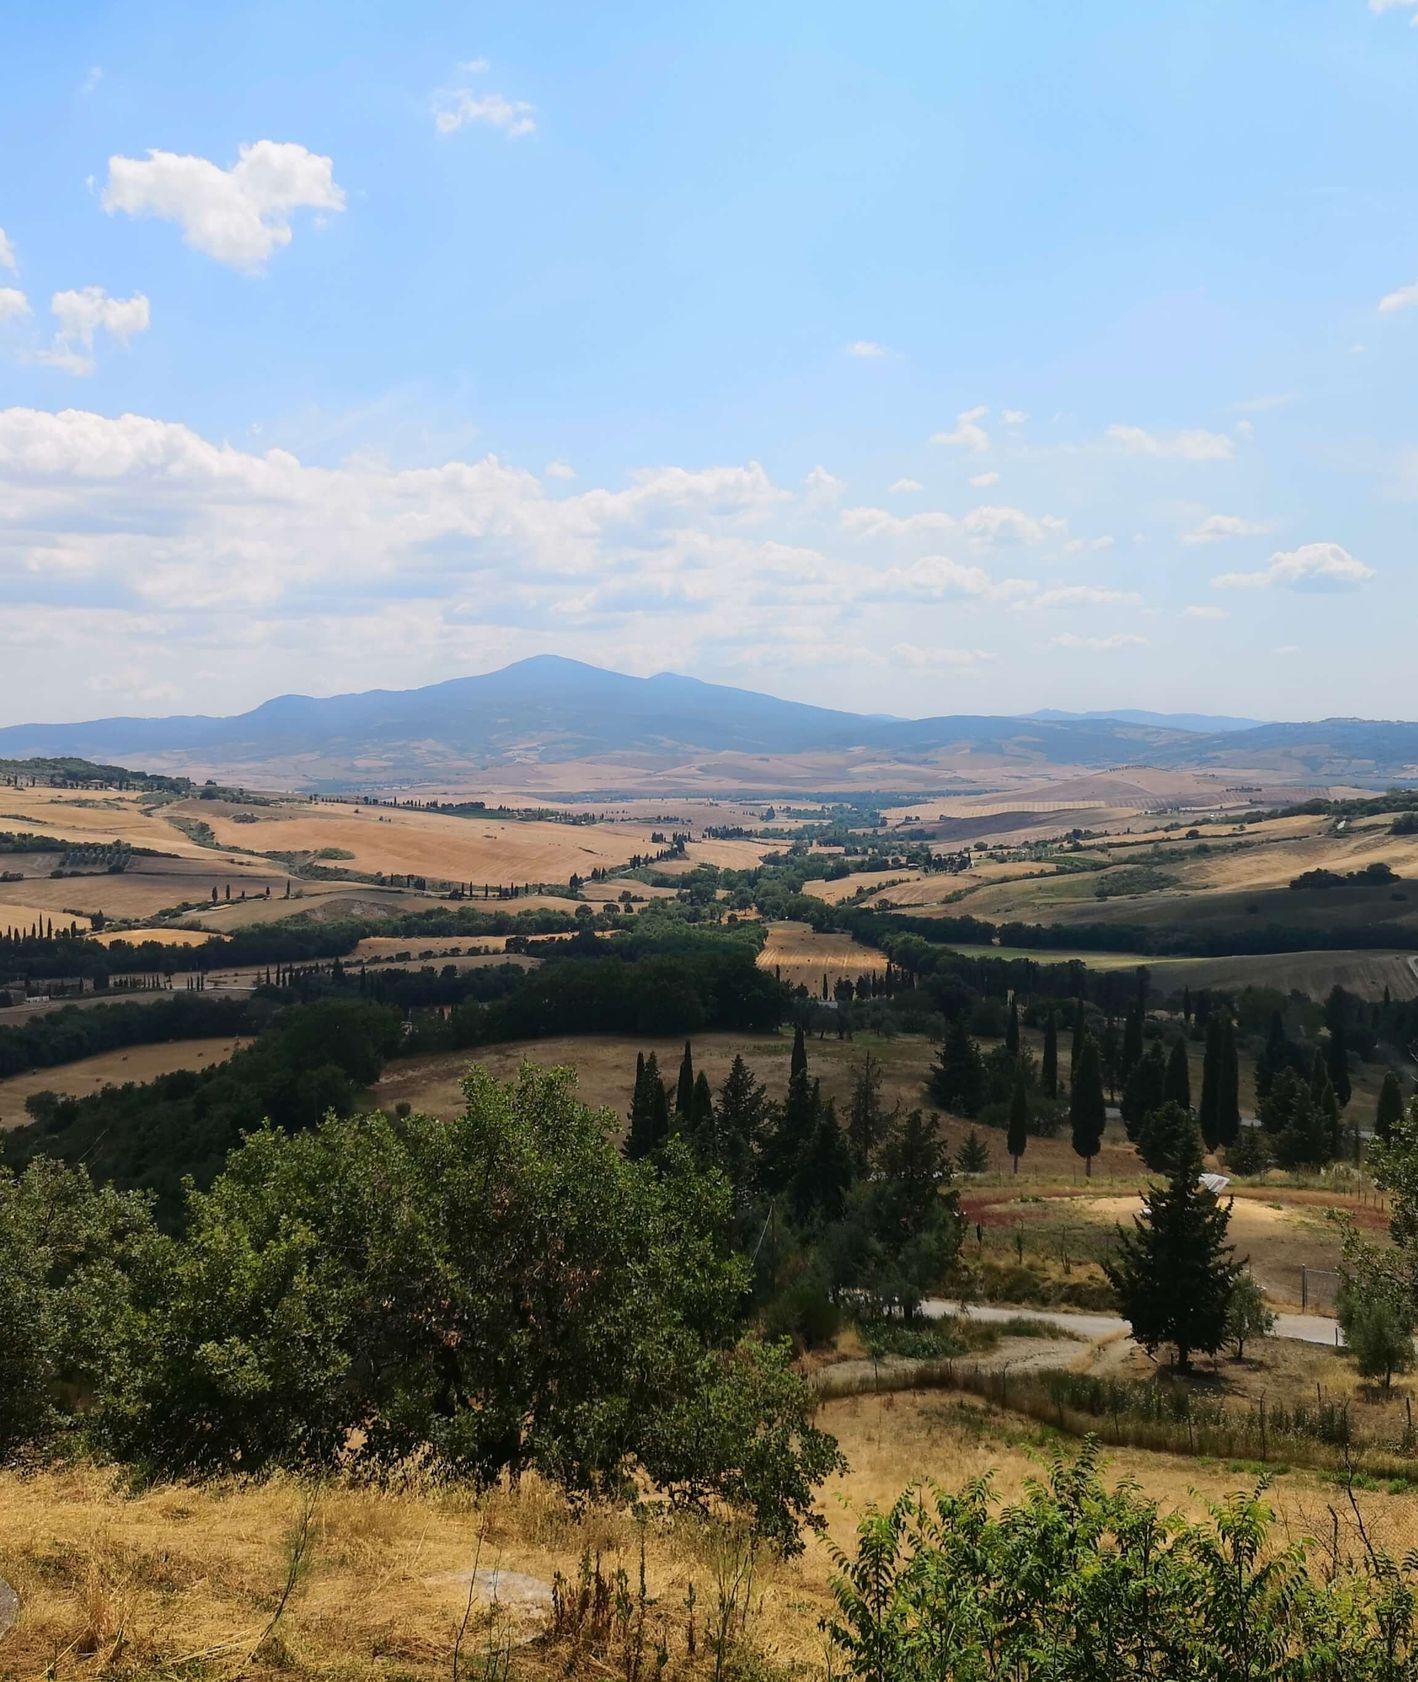 Monte Amiata (fot. Bartek Kieżun)